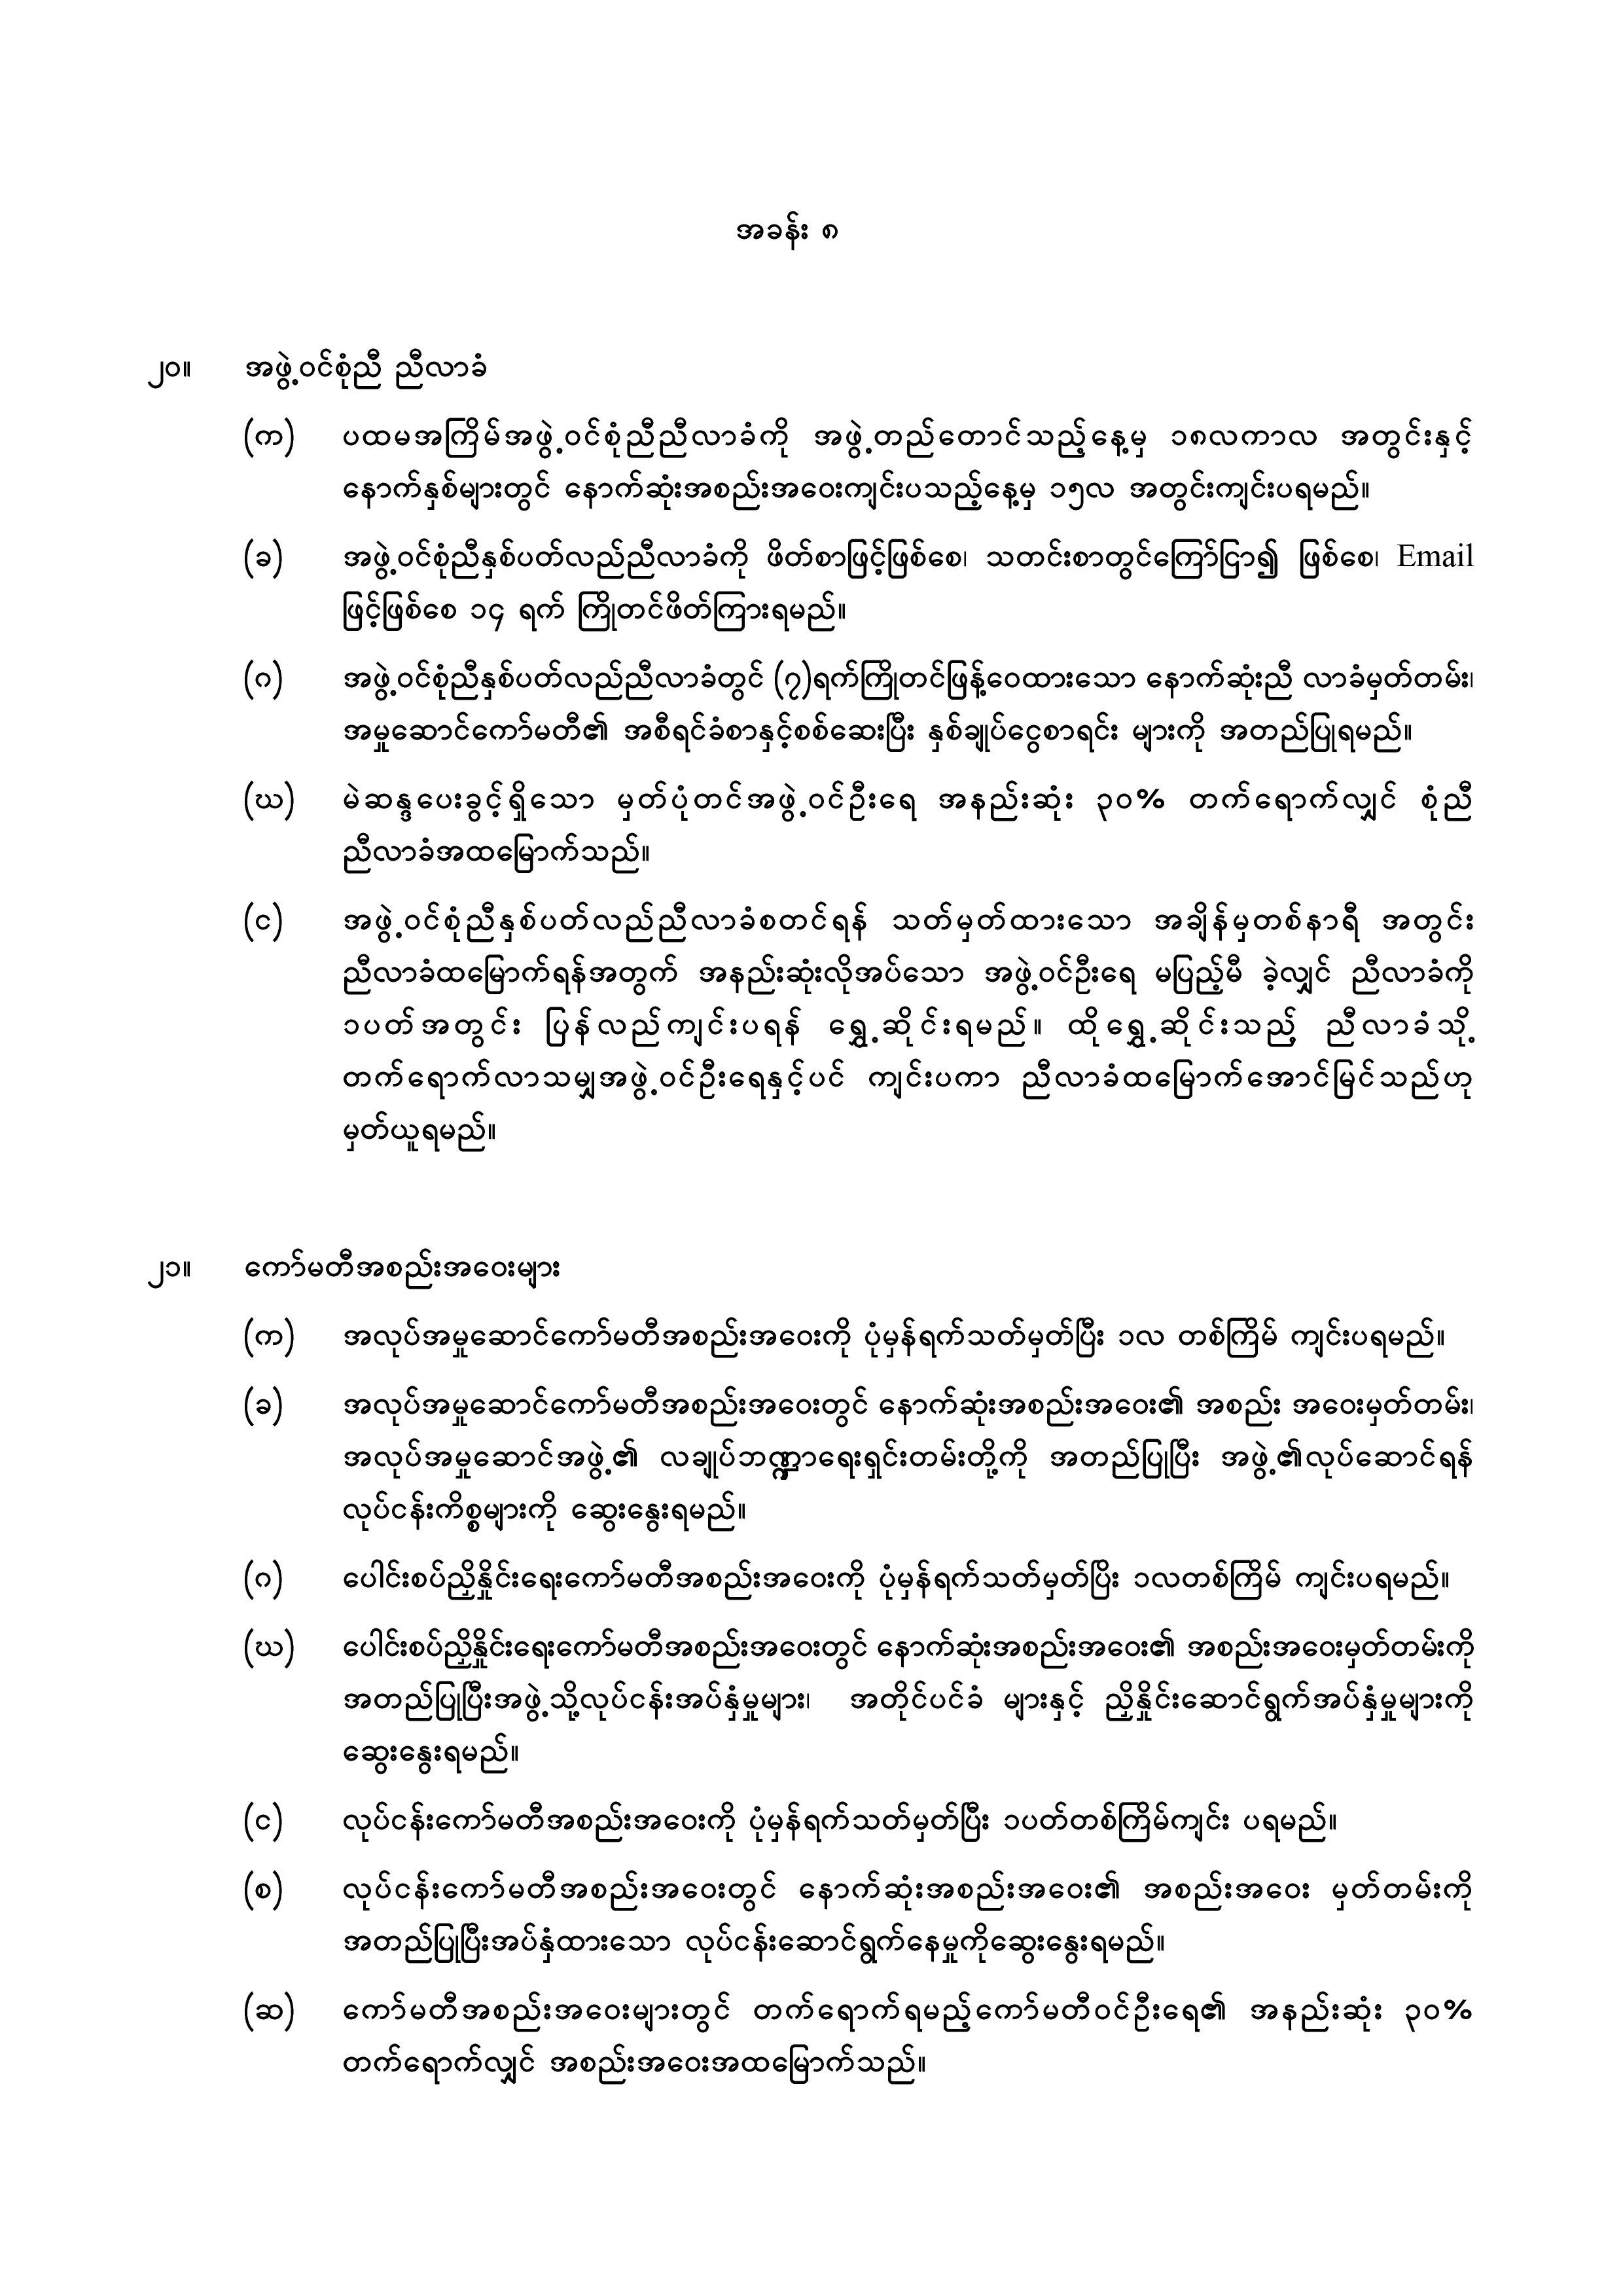 miceg-article-of-association-6